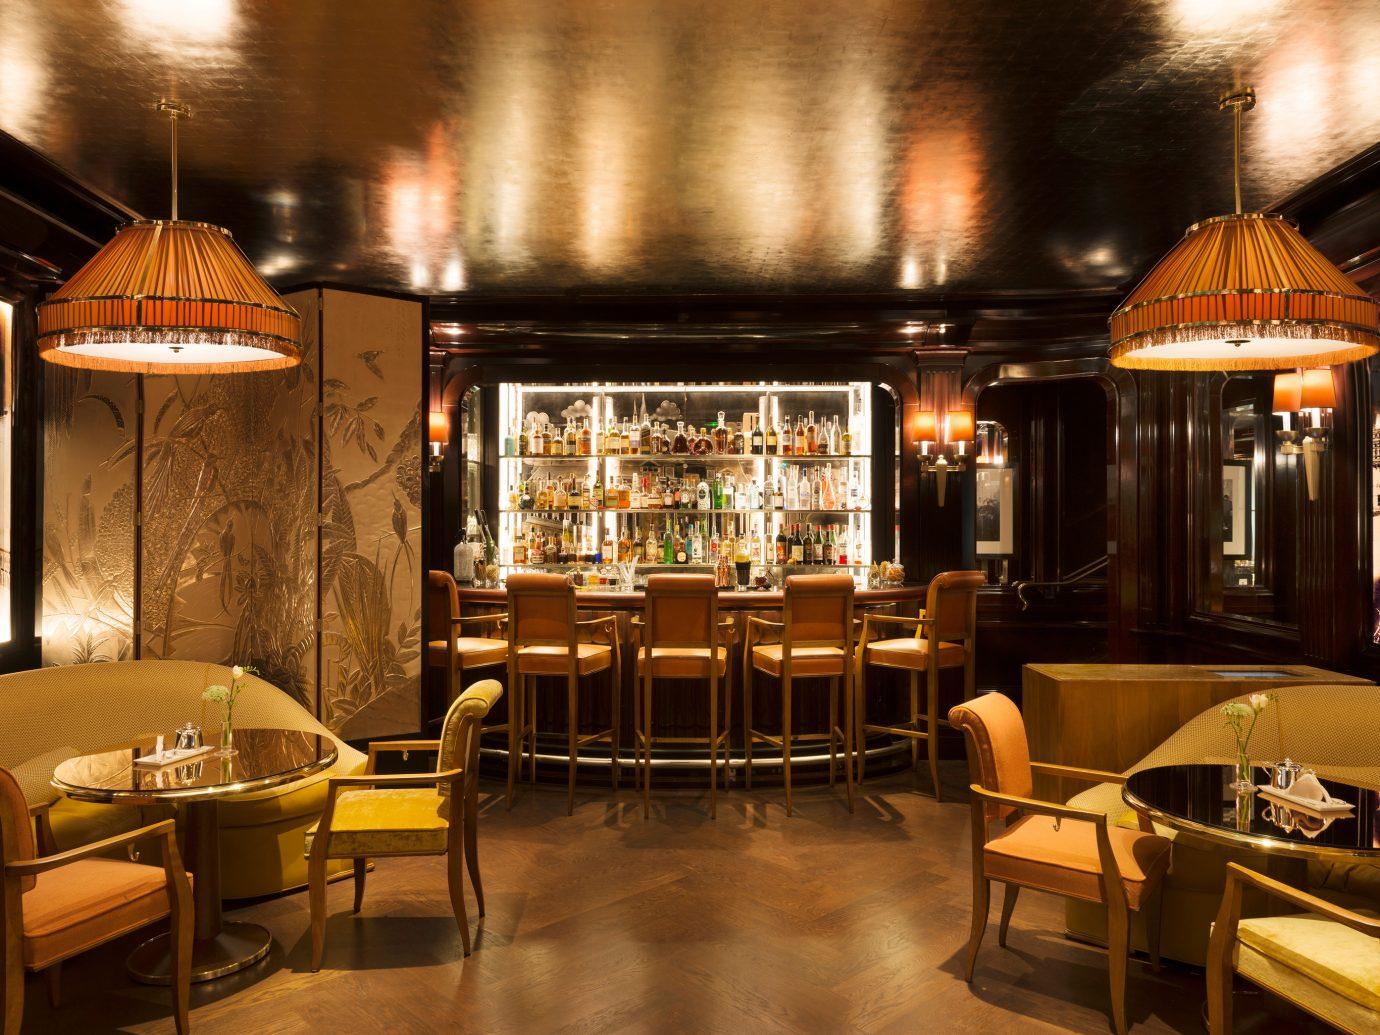 Hemmingway bar at the Ritz Paris